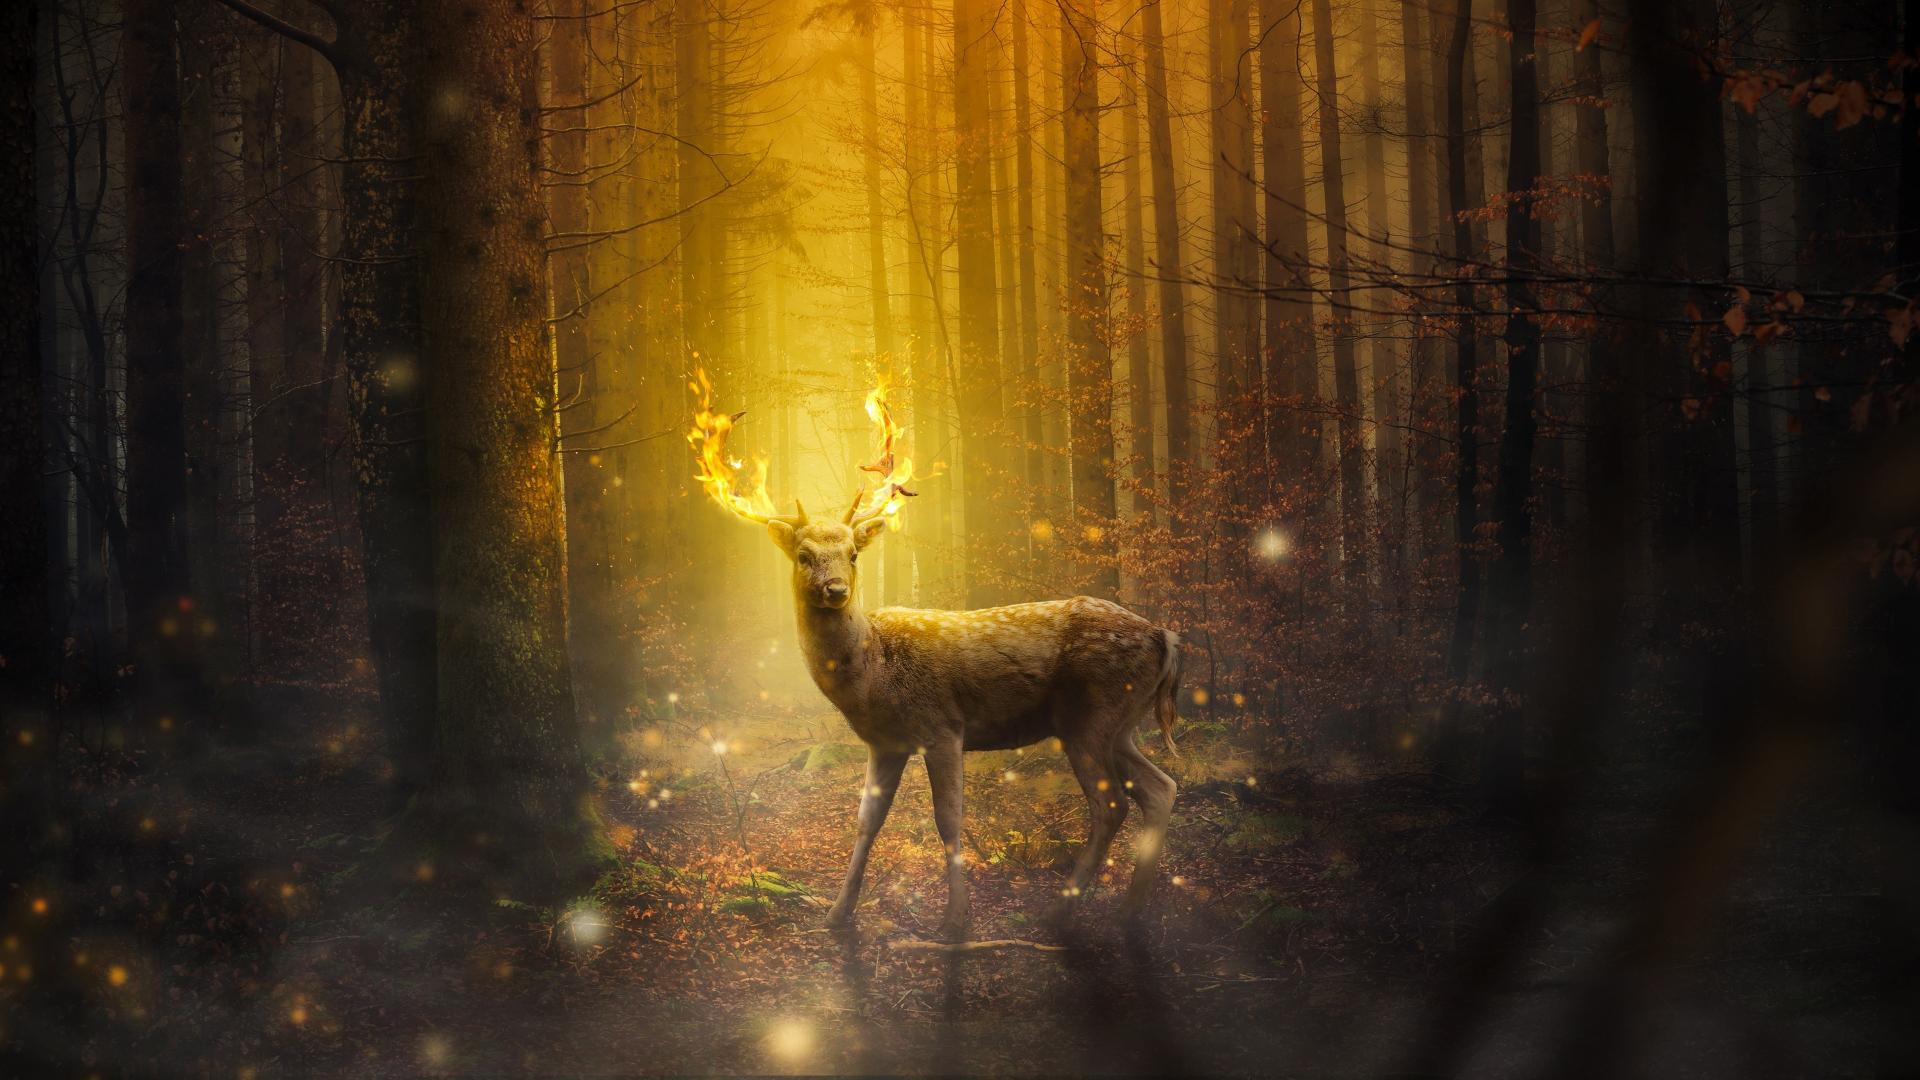 Download 1920x1080 wallpaper dear, forest, digital art, full hd ...